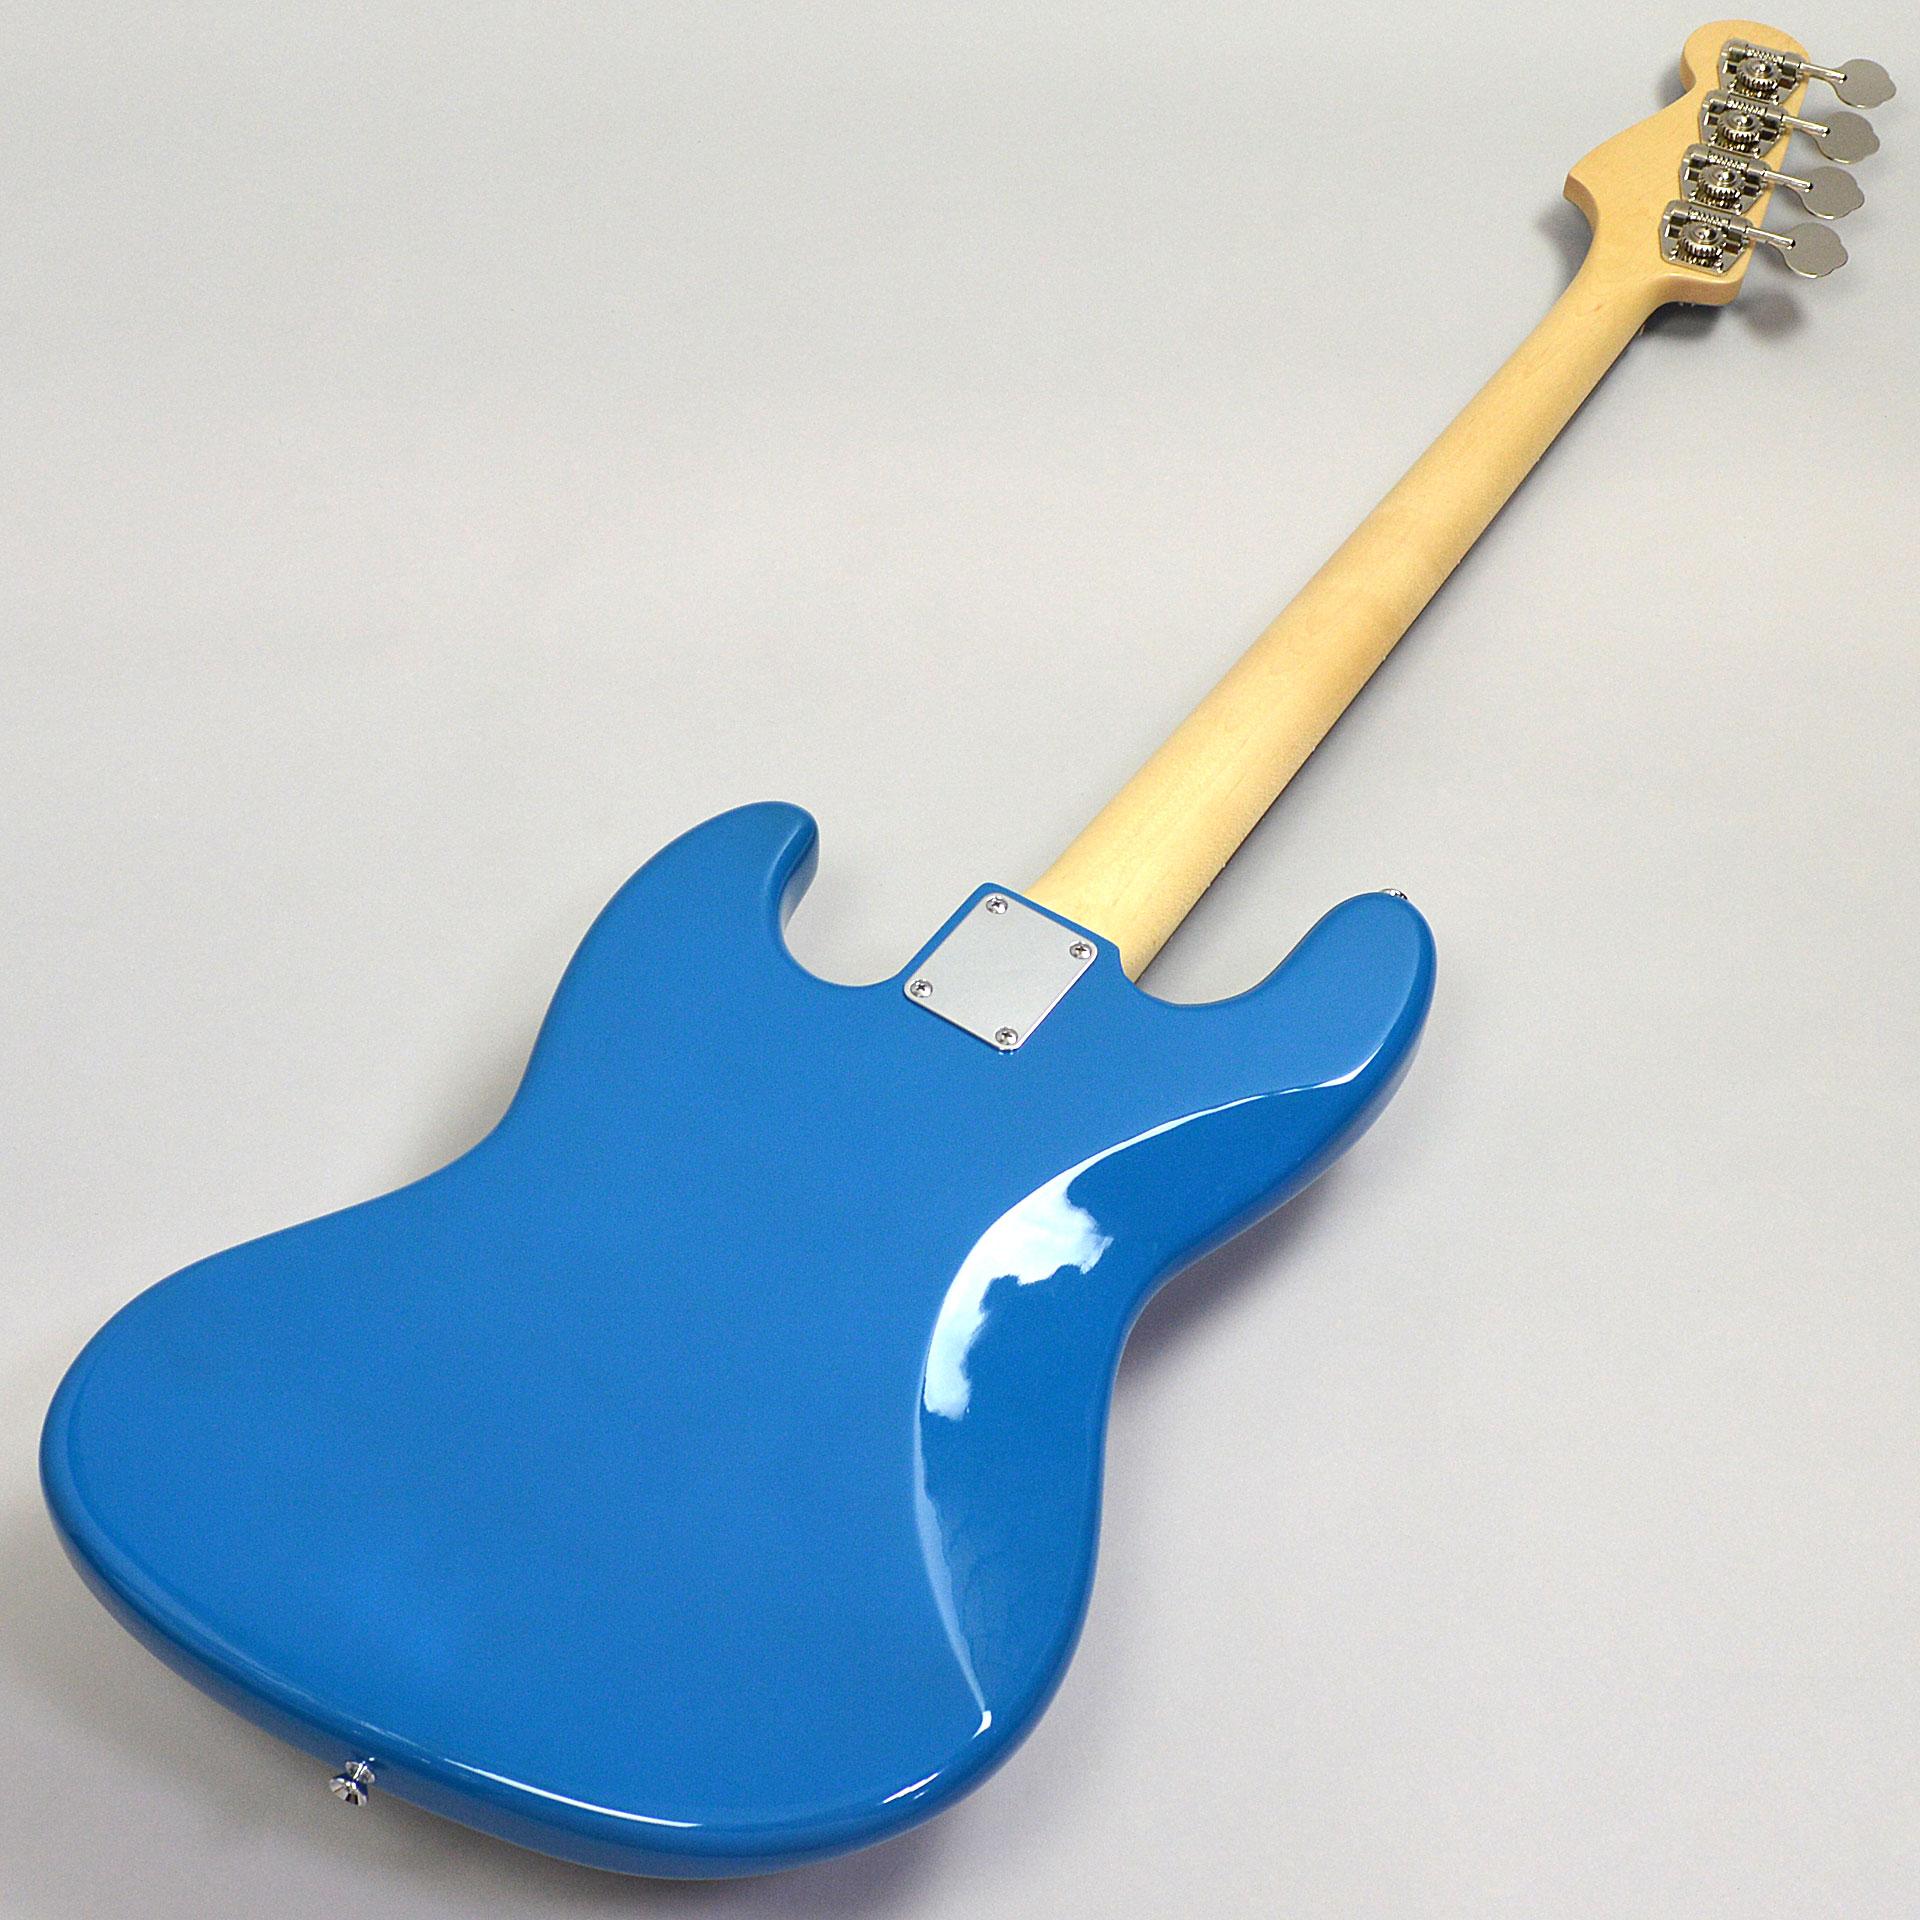 B21-J Al/L/Ash/Cobalt Blueのボディバック-アップ画像